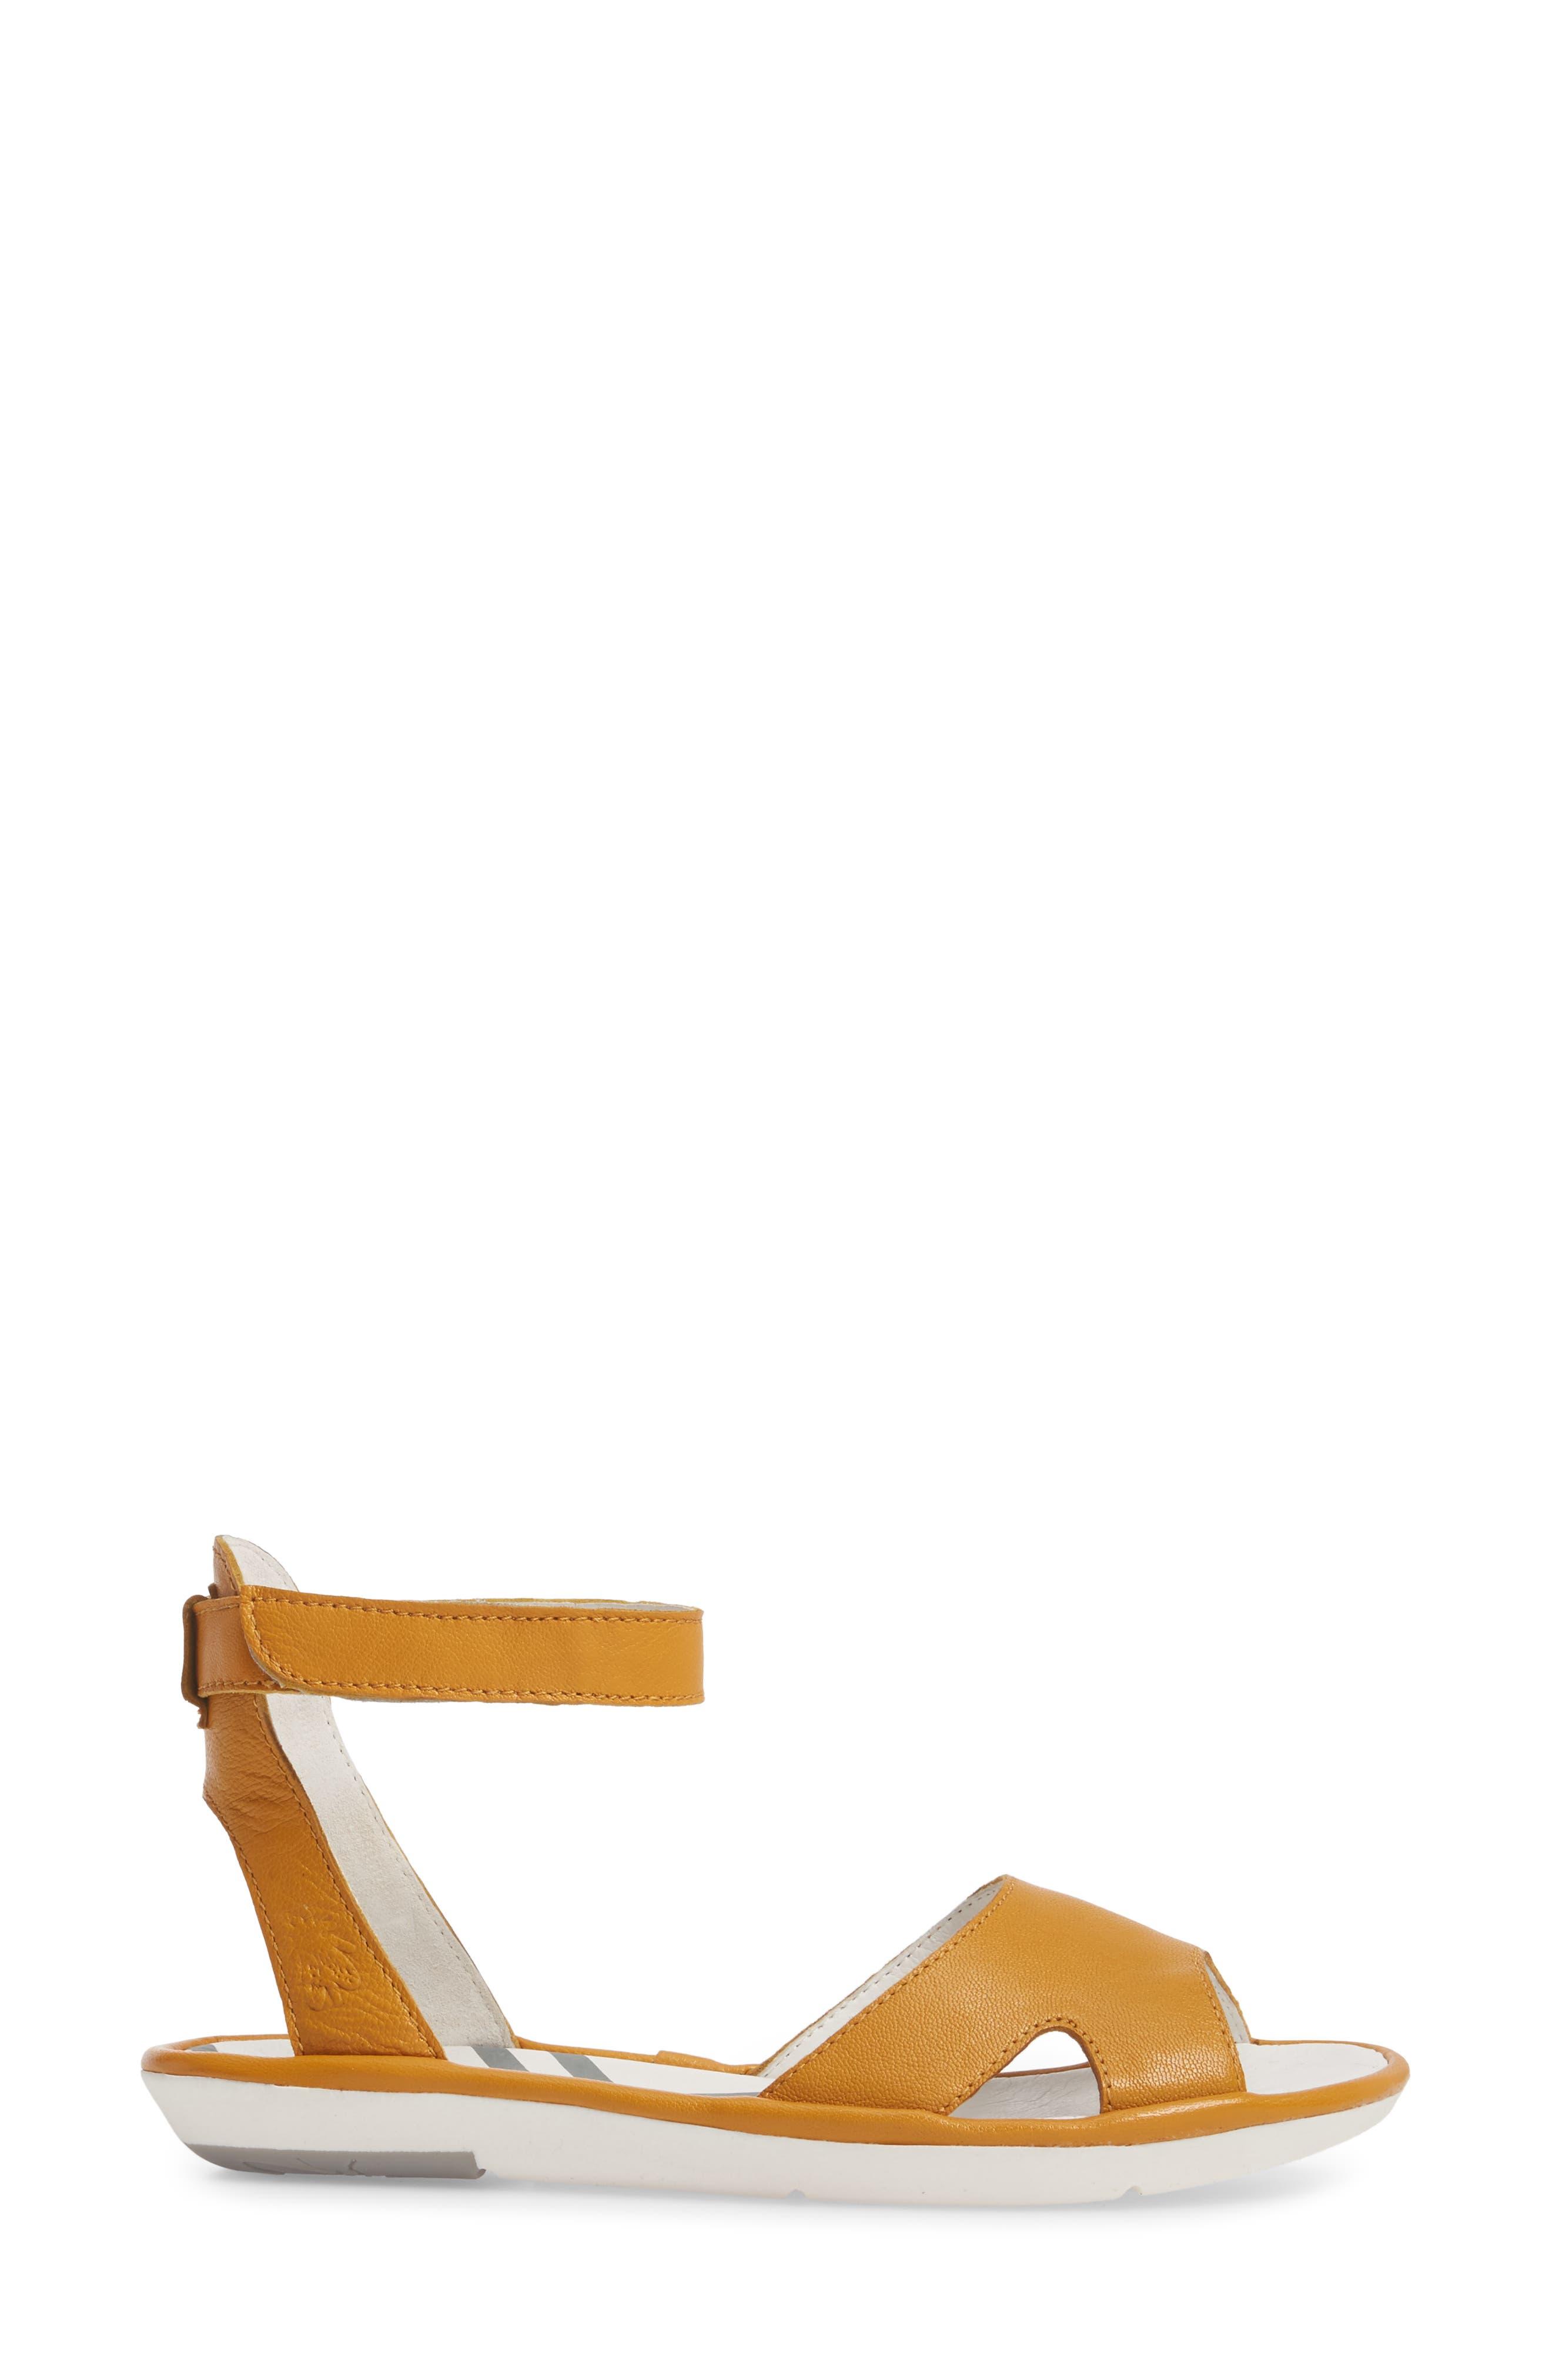 Mafi Sandal,                             Alternate thumbnail 3, color,                             Honey Leather